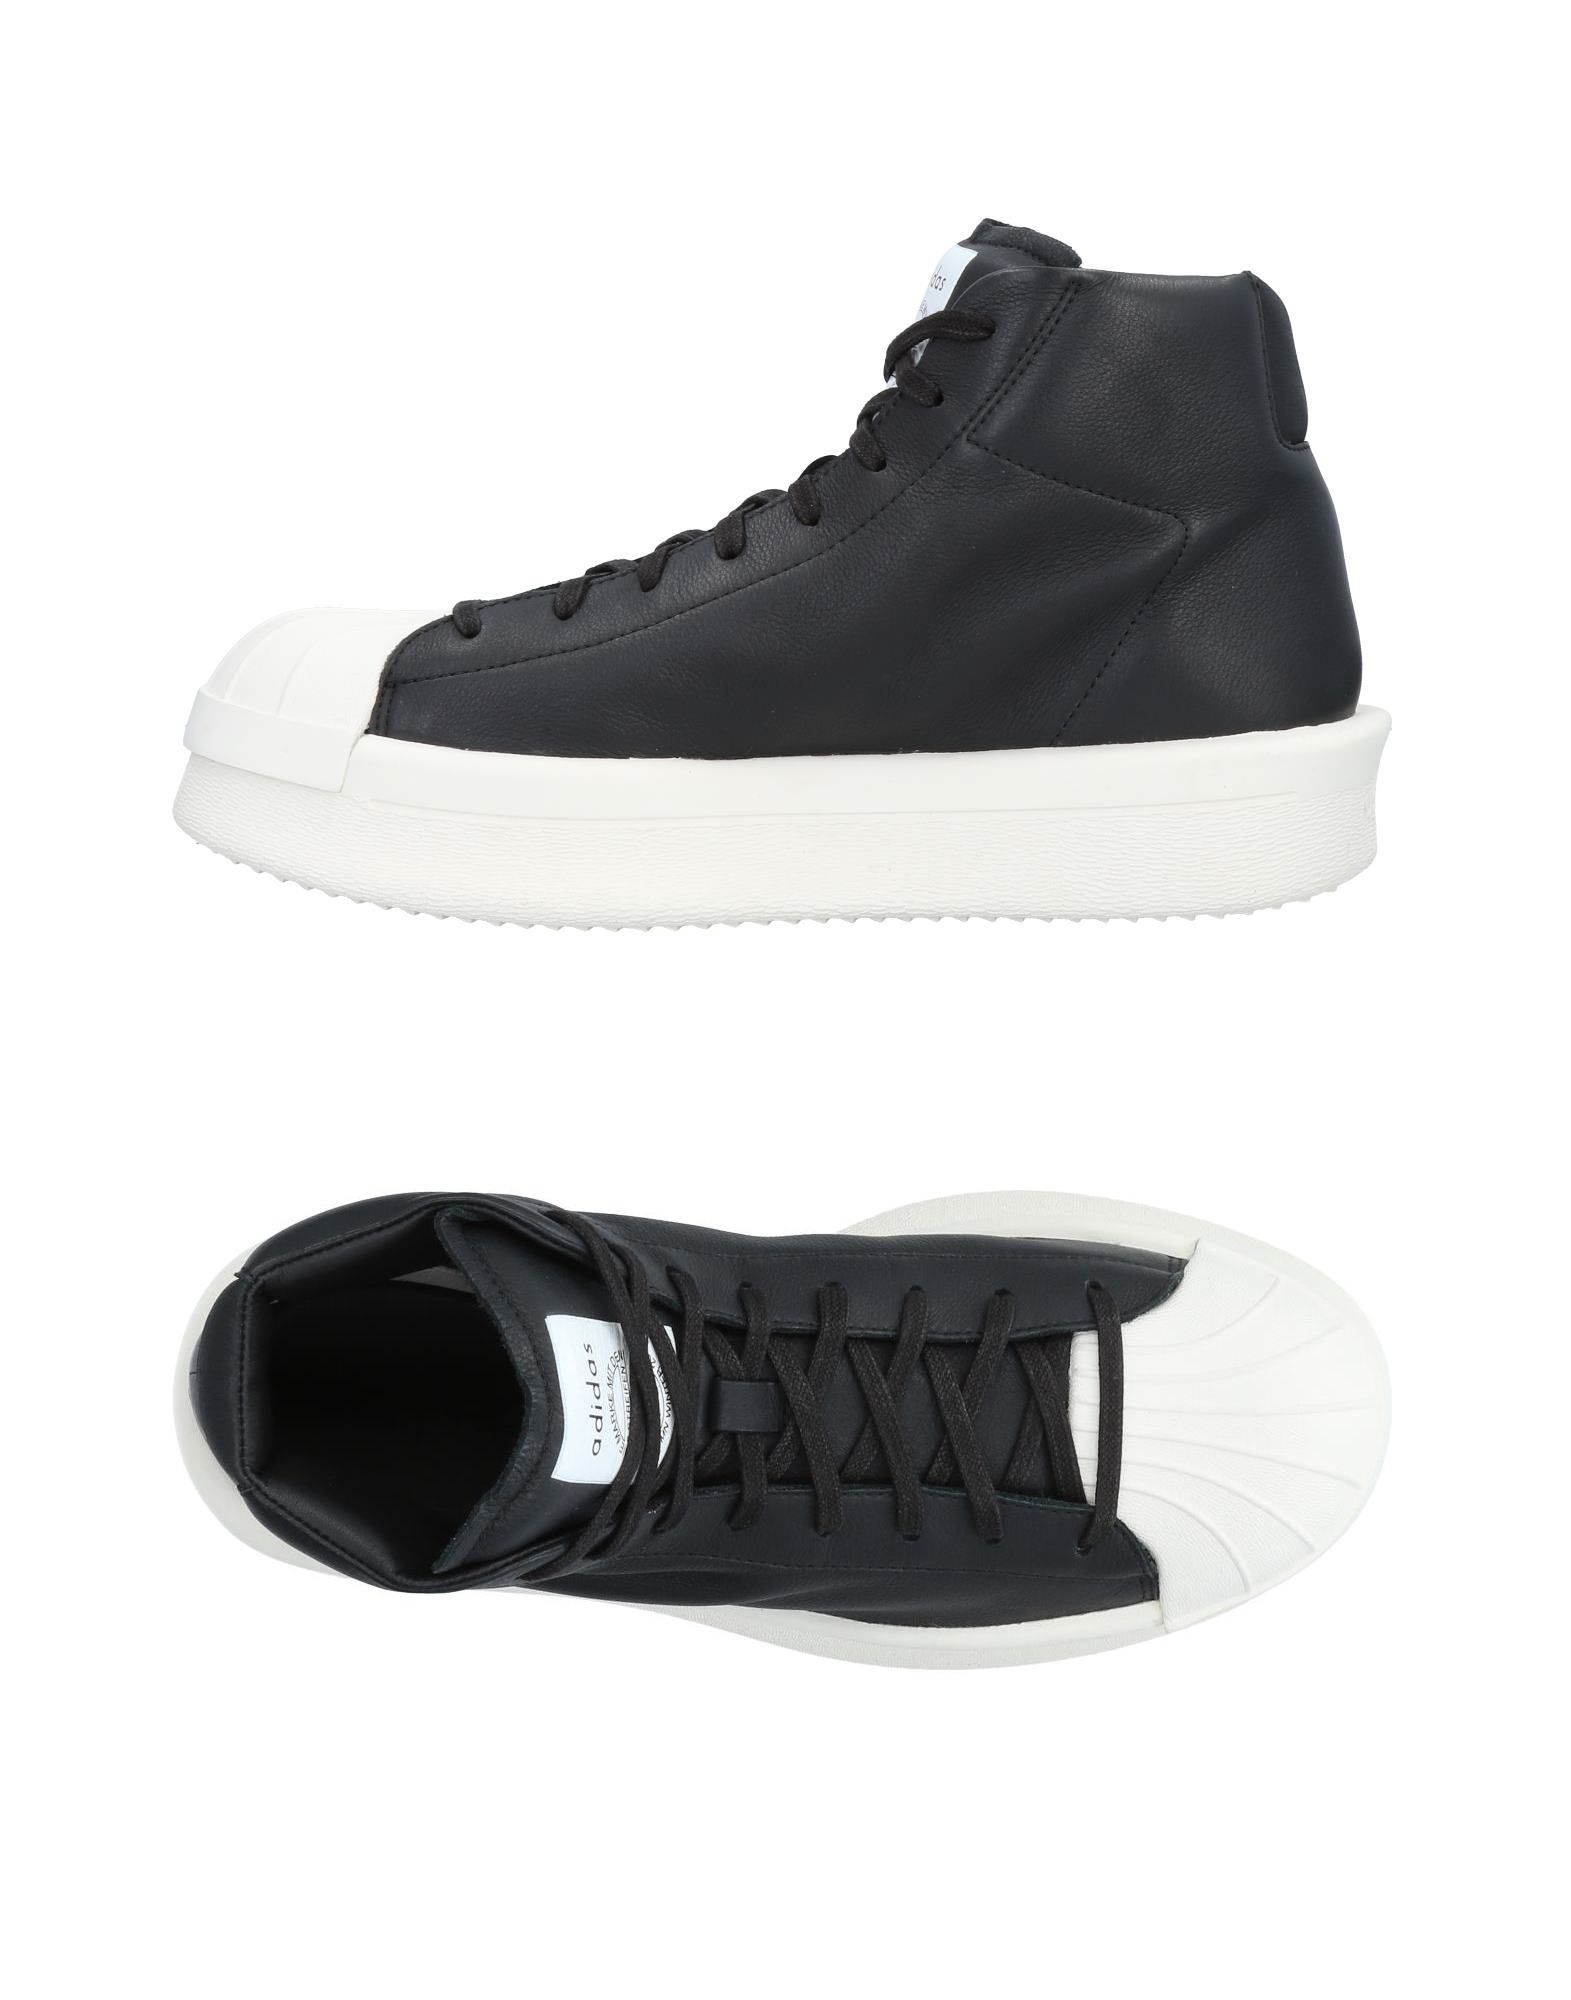 Rick Owens X Adidas Sneakers - Men Rick Owens X Adidas Sneakers ... c7e7cc524f